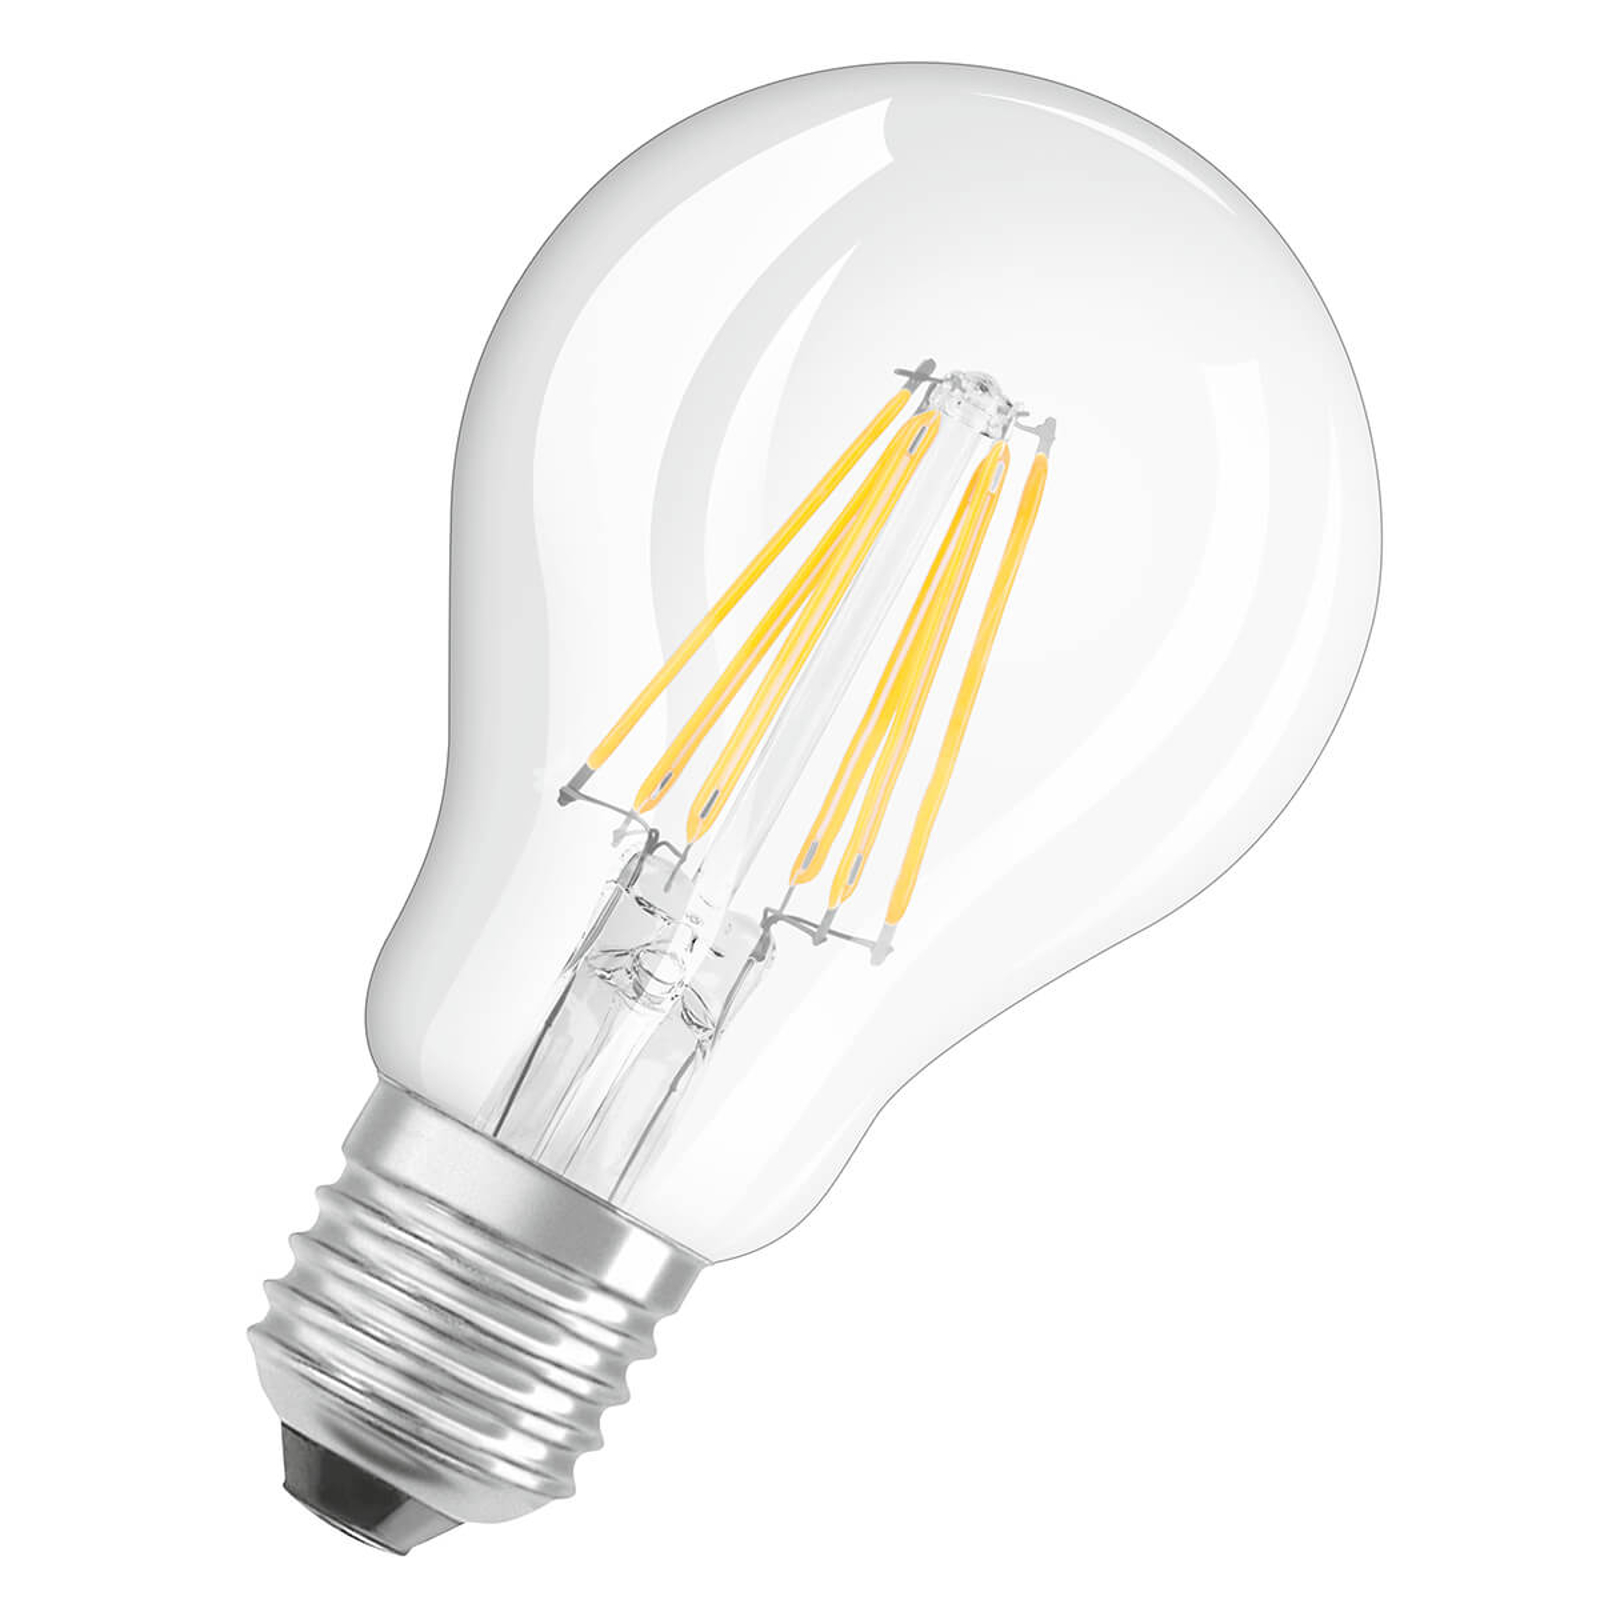 OSRAM LED-Lampe E27 6,5W universalweiß, 806 Lumen